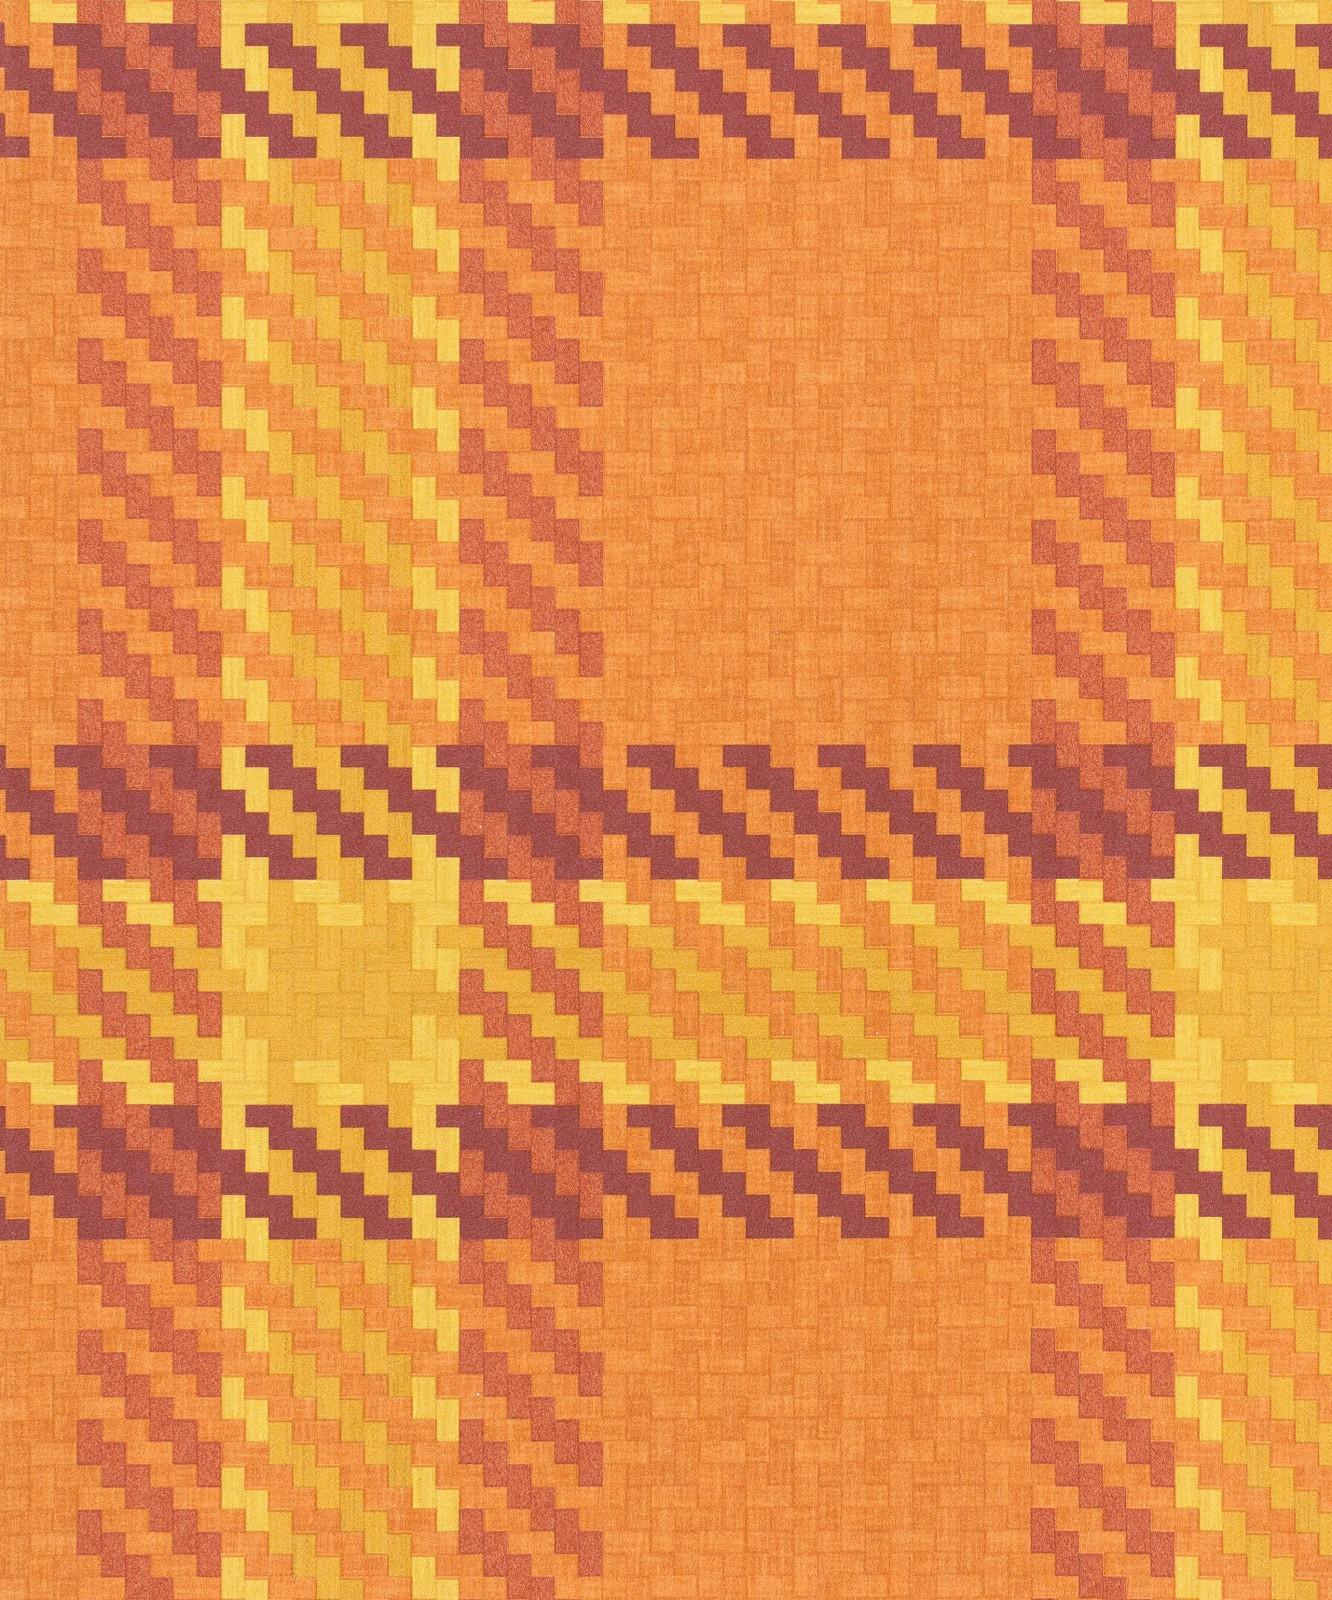 tapete rasch funky flair 721669 kariert orange gelb. Black Bedroom Furniture Sets. Home Design Ideas